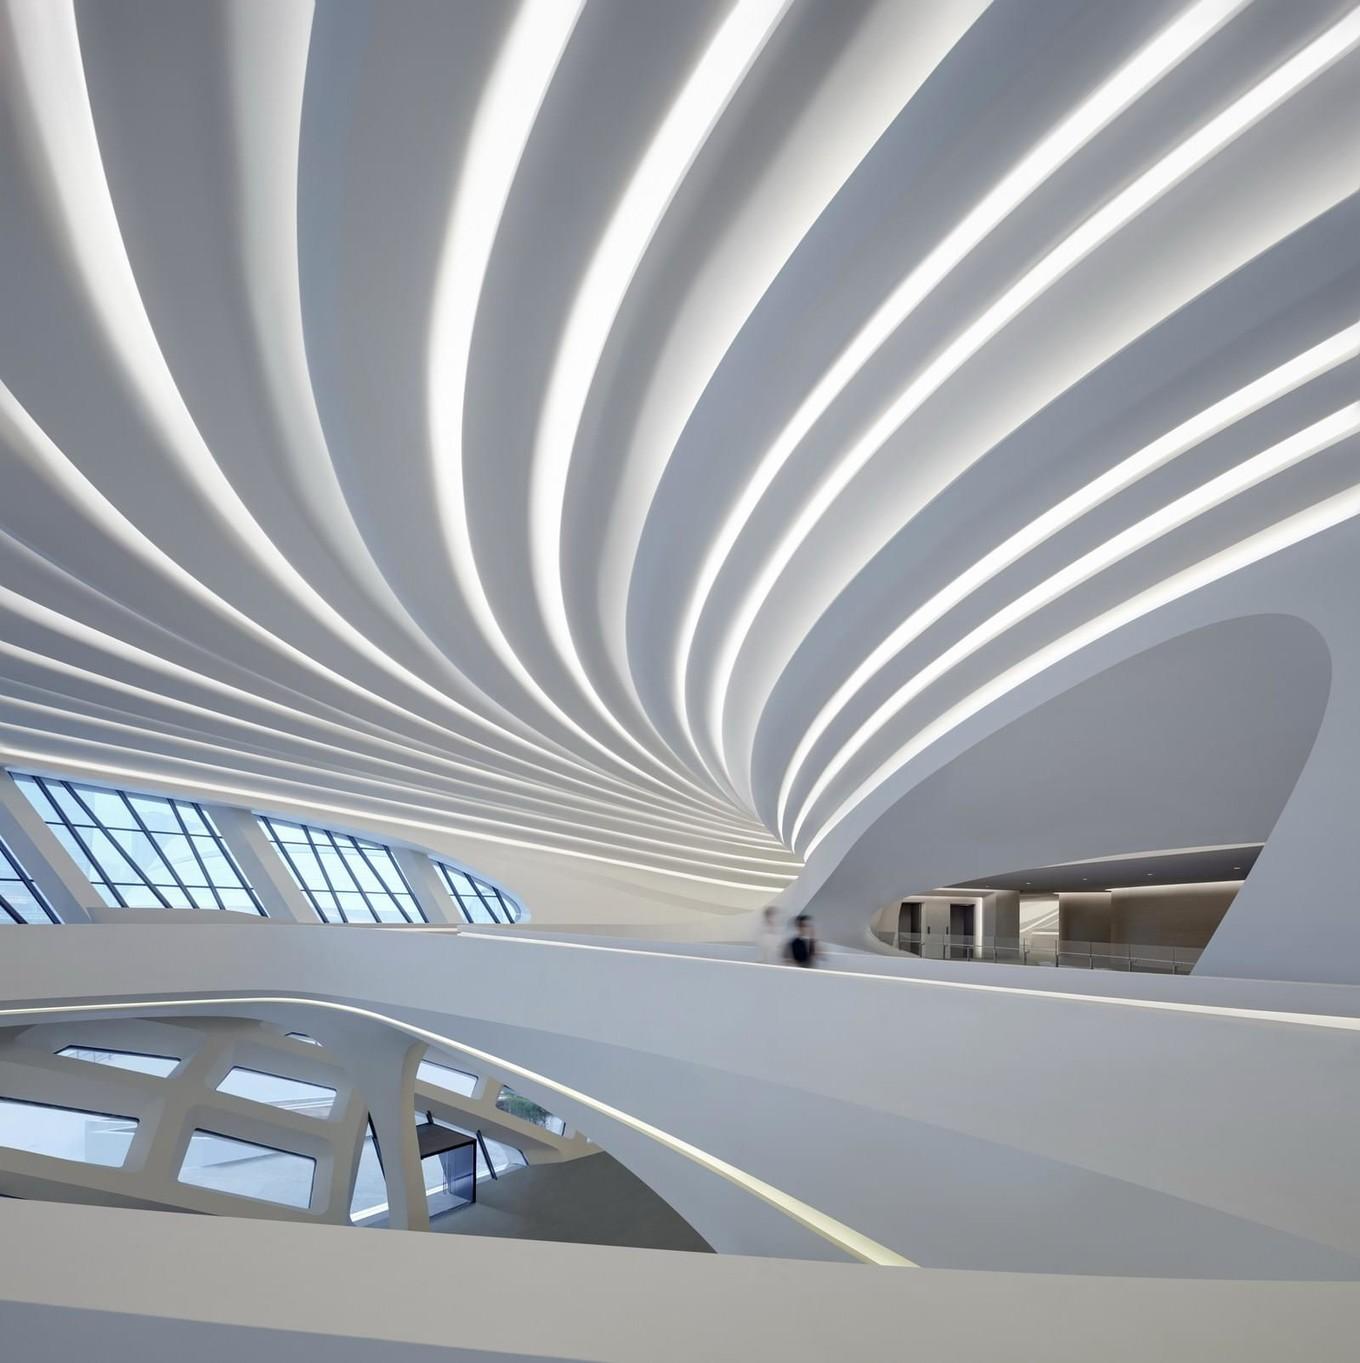 Центр культуры и искусств от Zaha Hadid Architects в Китае